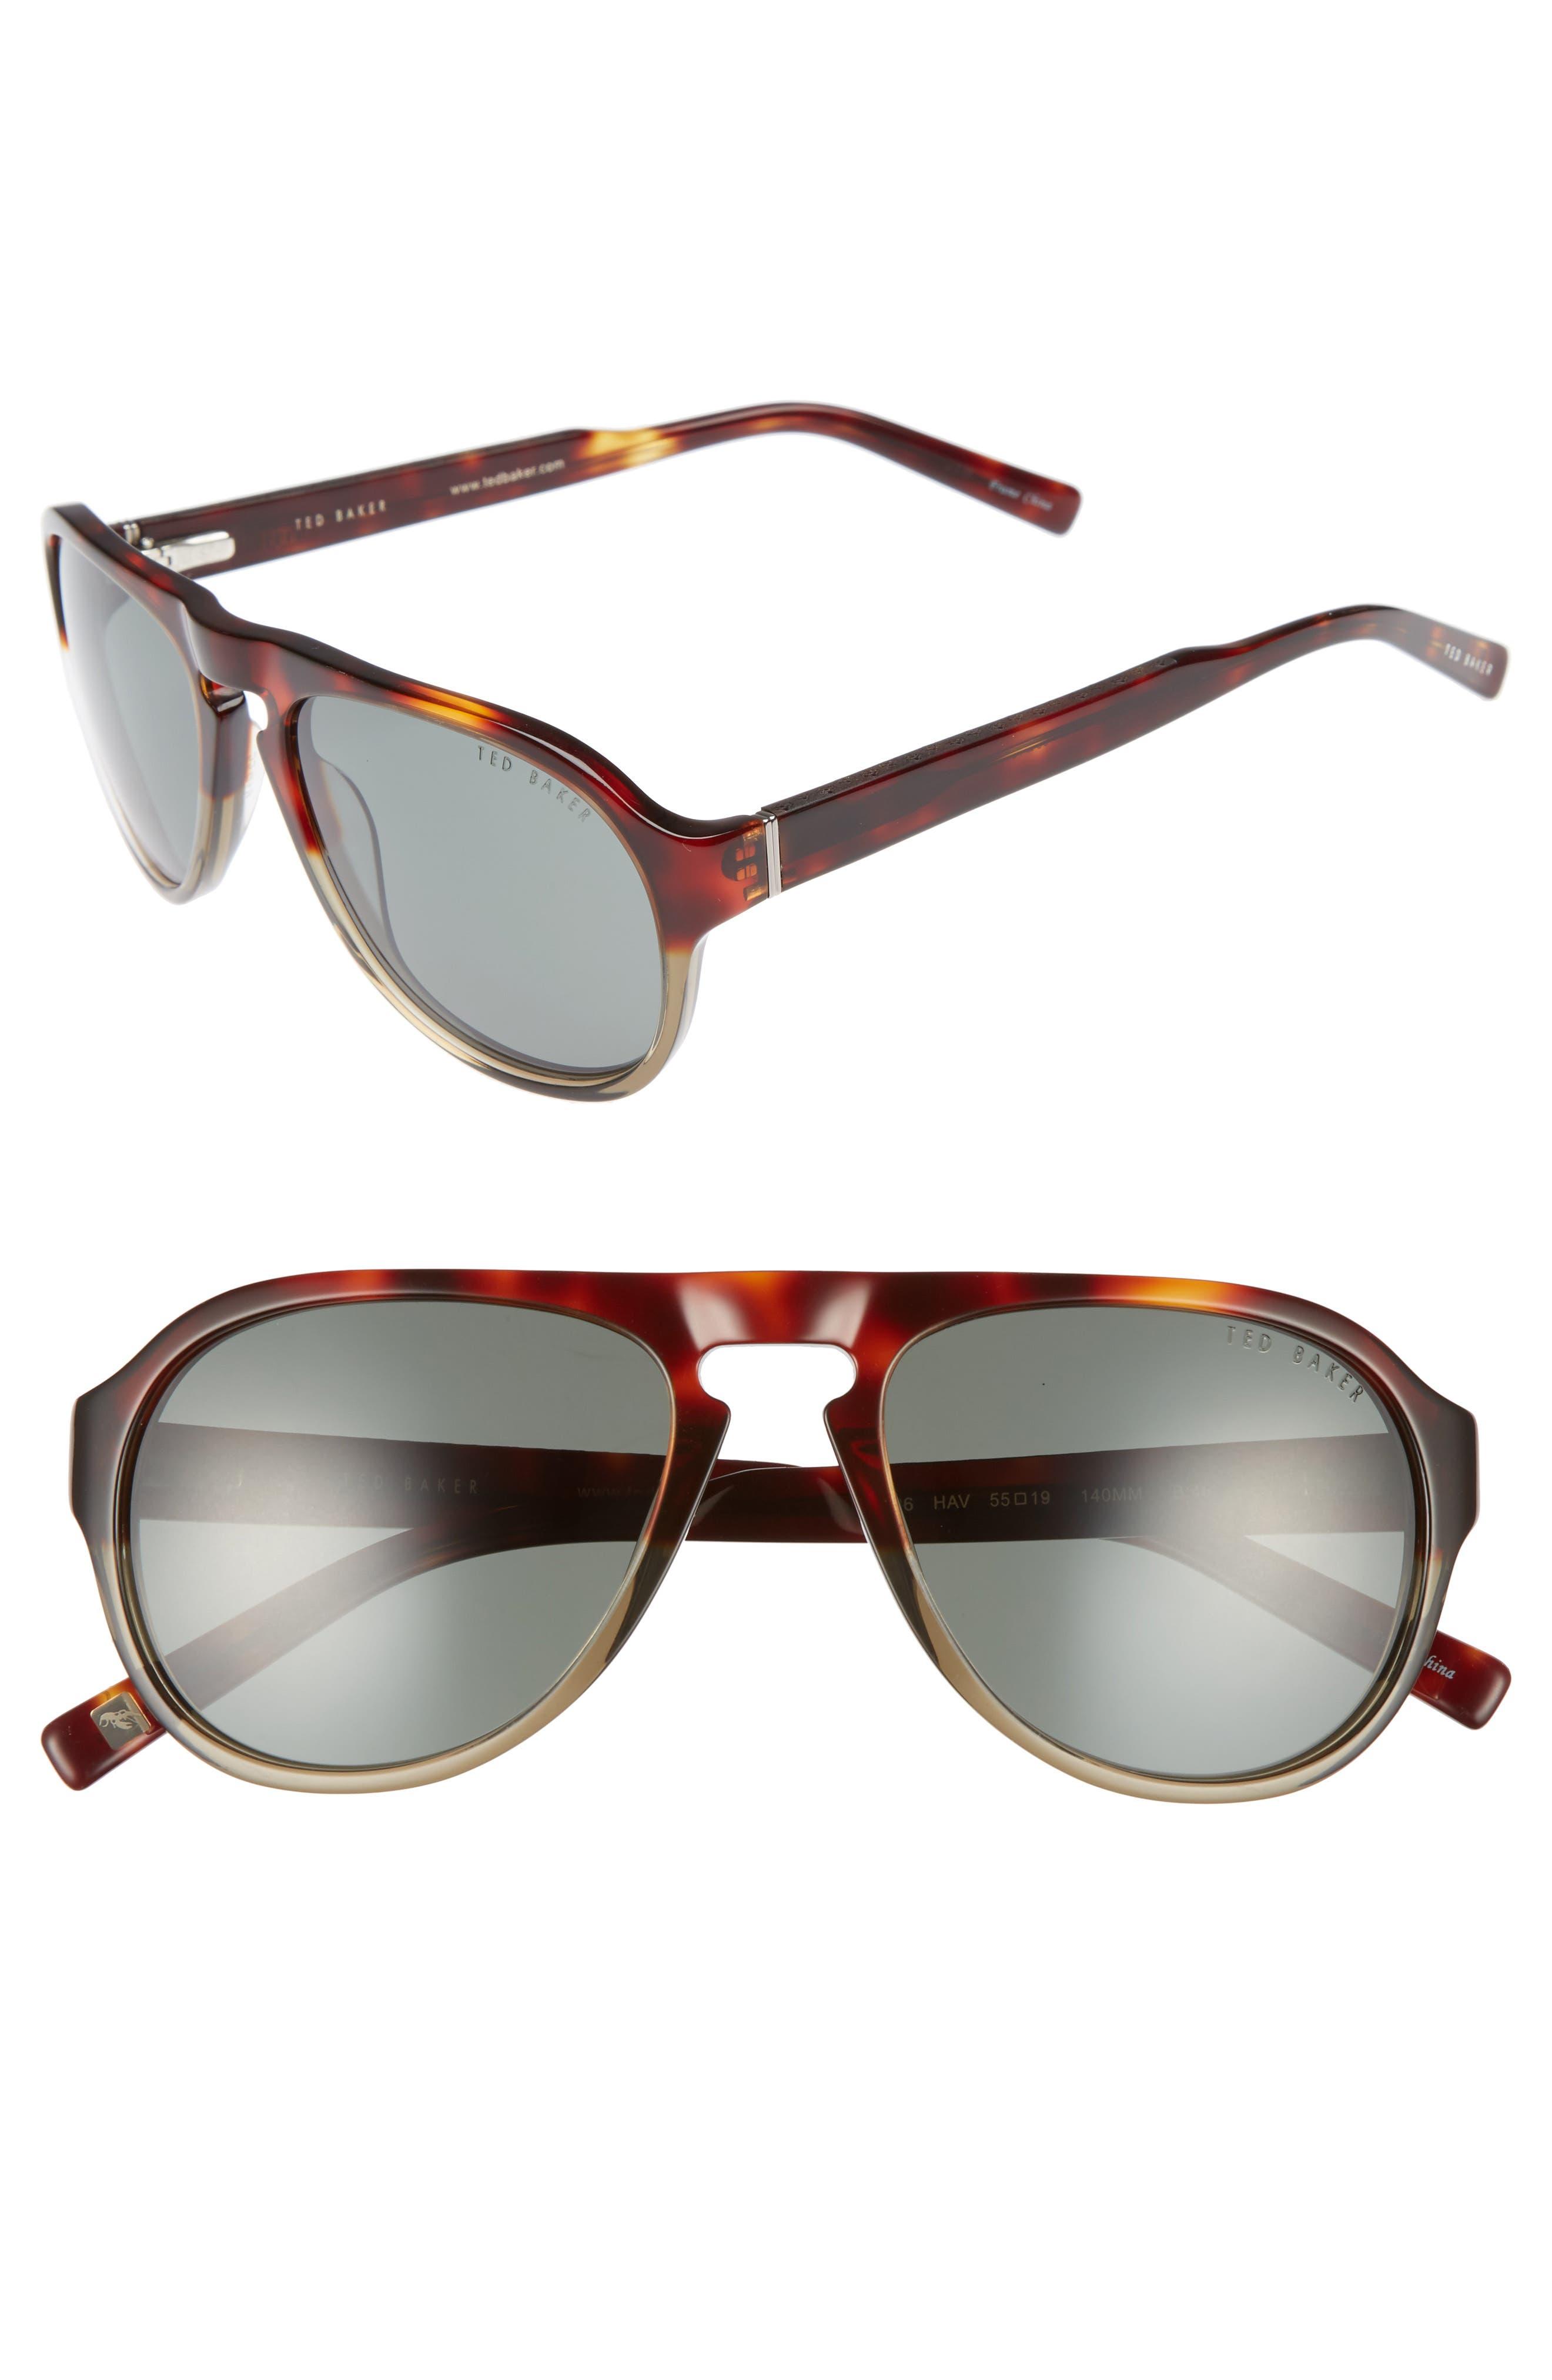 55mm Polarized Aviator Sunglasses,                             Main thumbnail 1, color,                             241